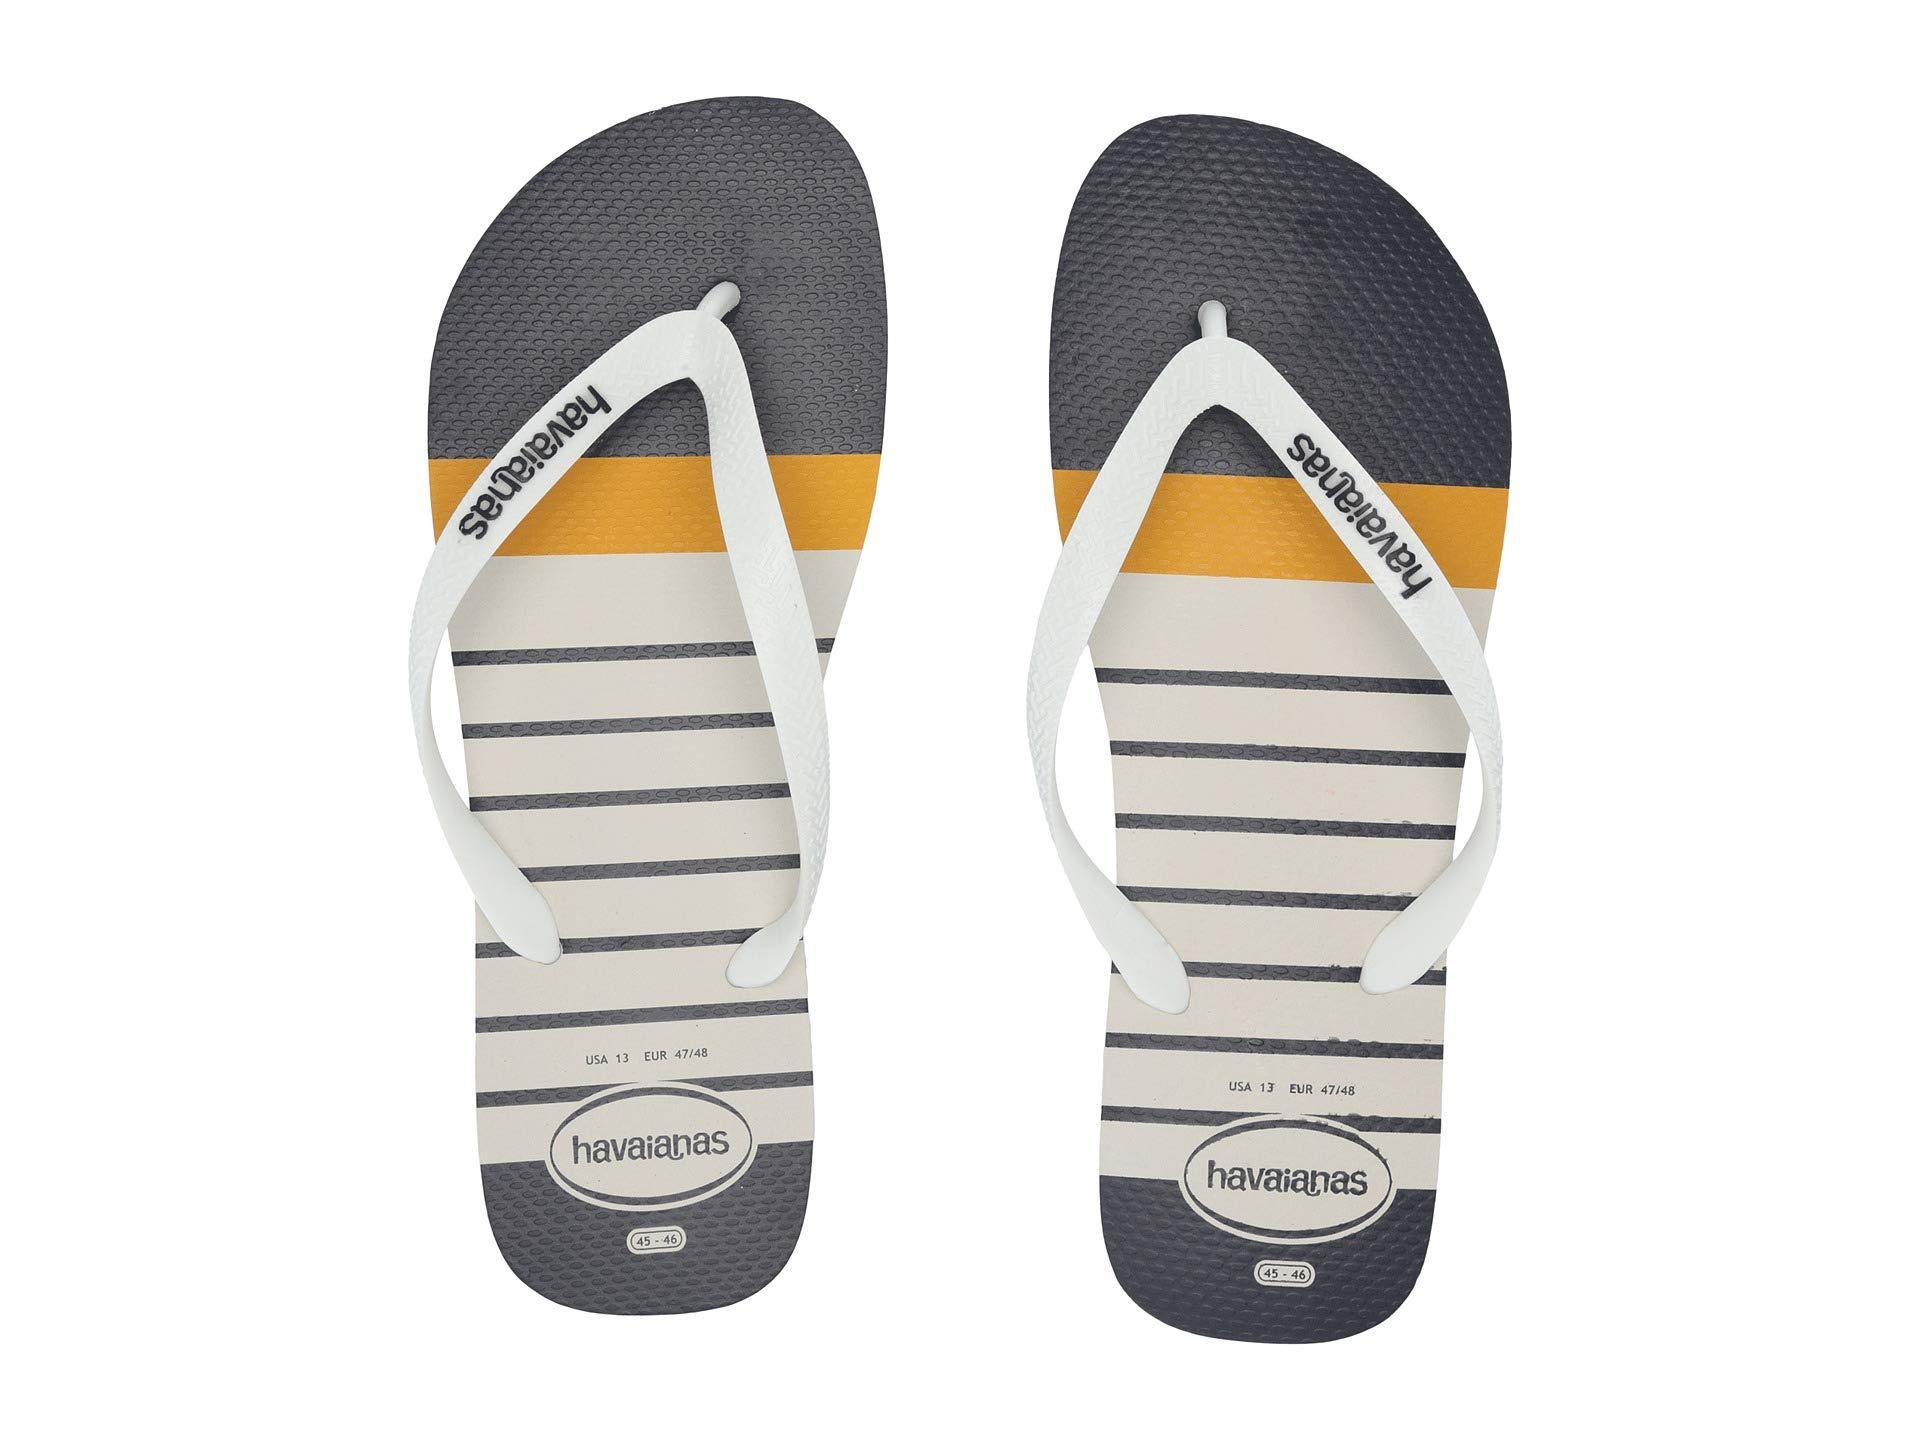 f9a3dc2c6 Havaianas - Top Nautical Flip-flops (navy Blue navy Blue) Men s Sandals.  View fullscreen